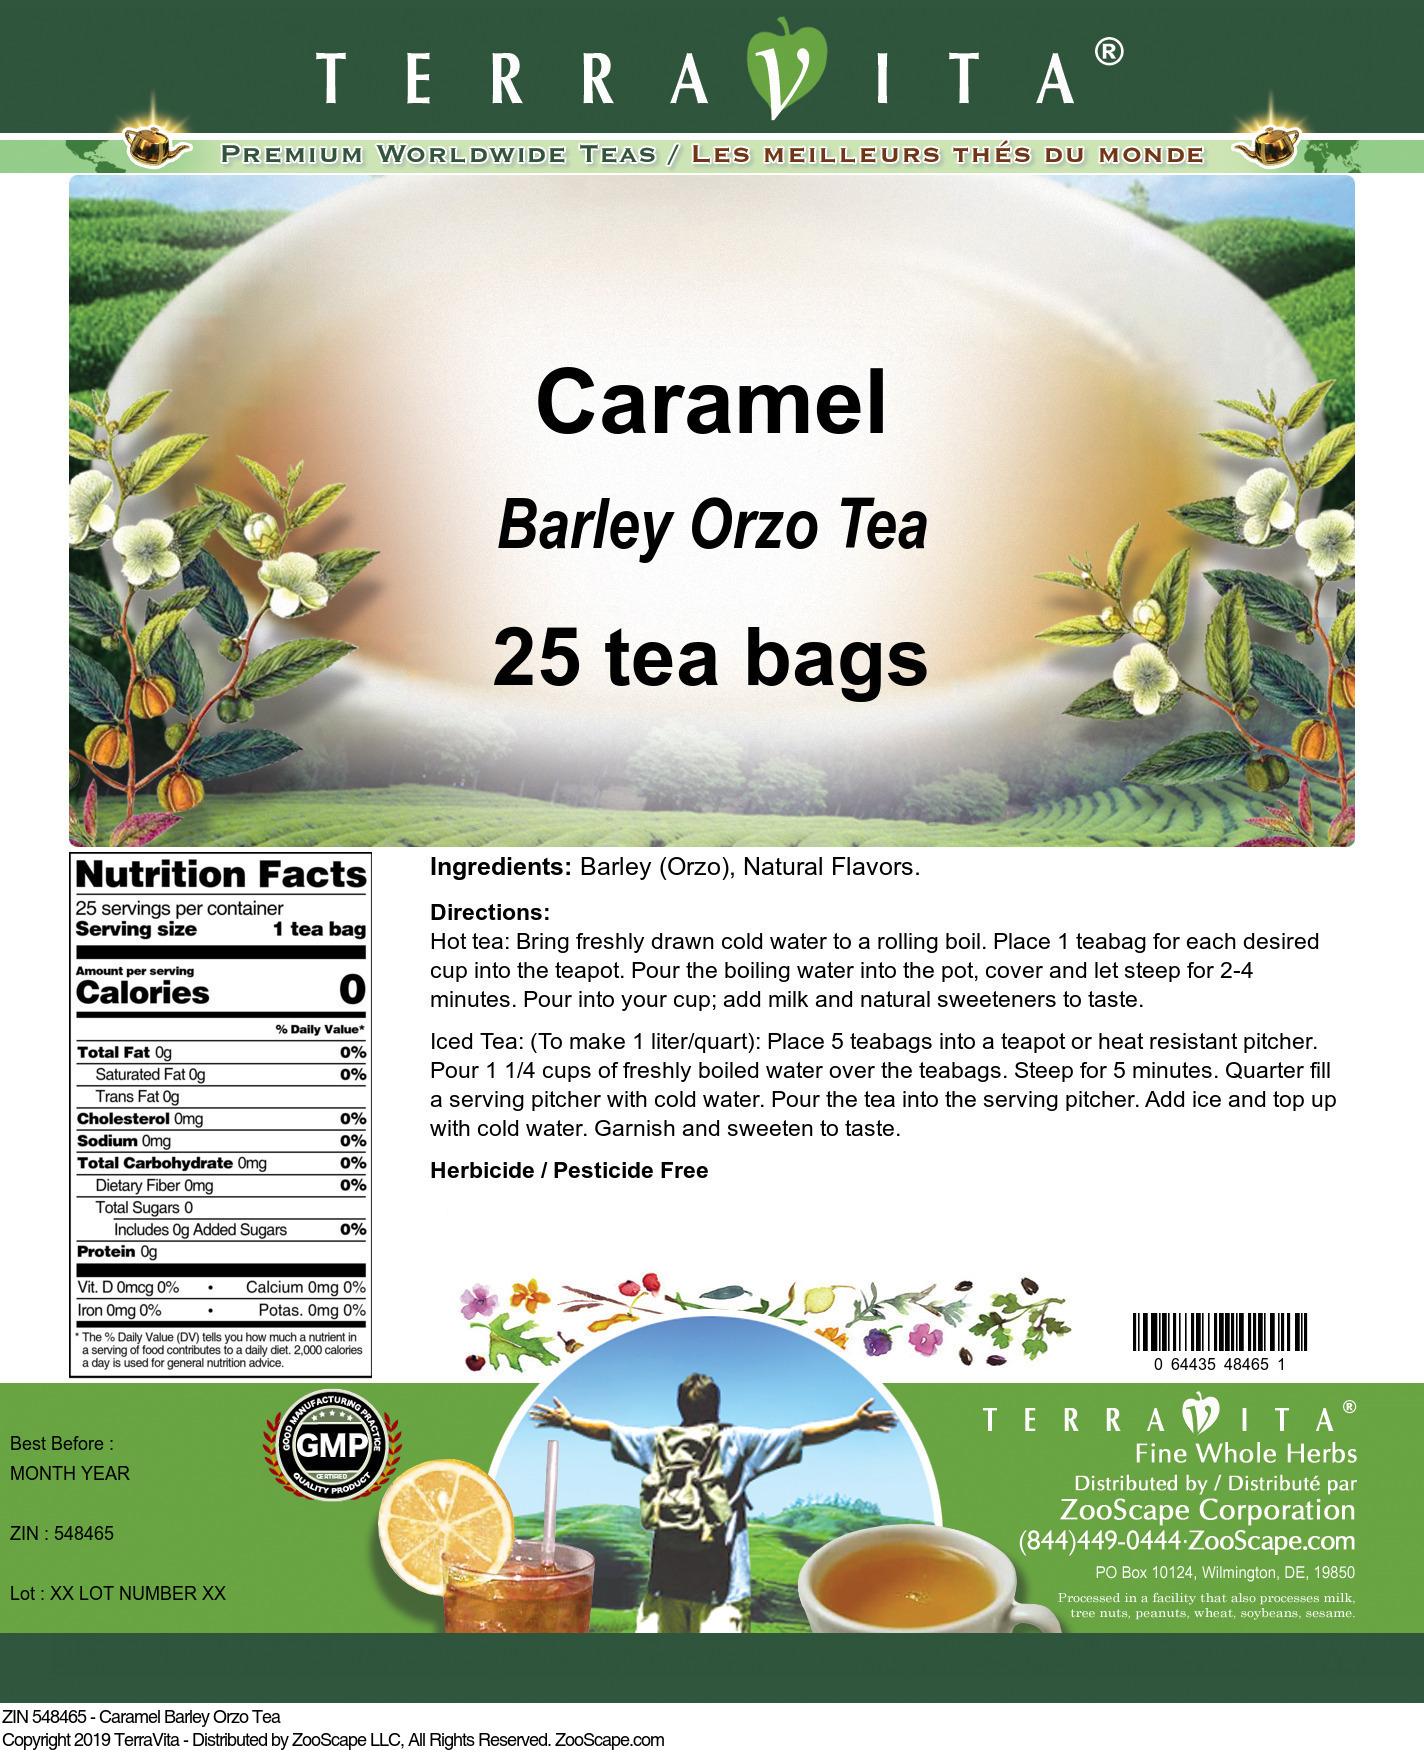 Caramel Barley Orzo Tea